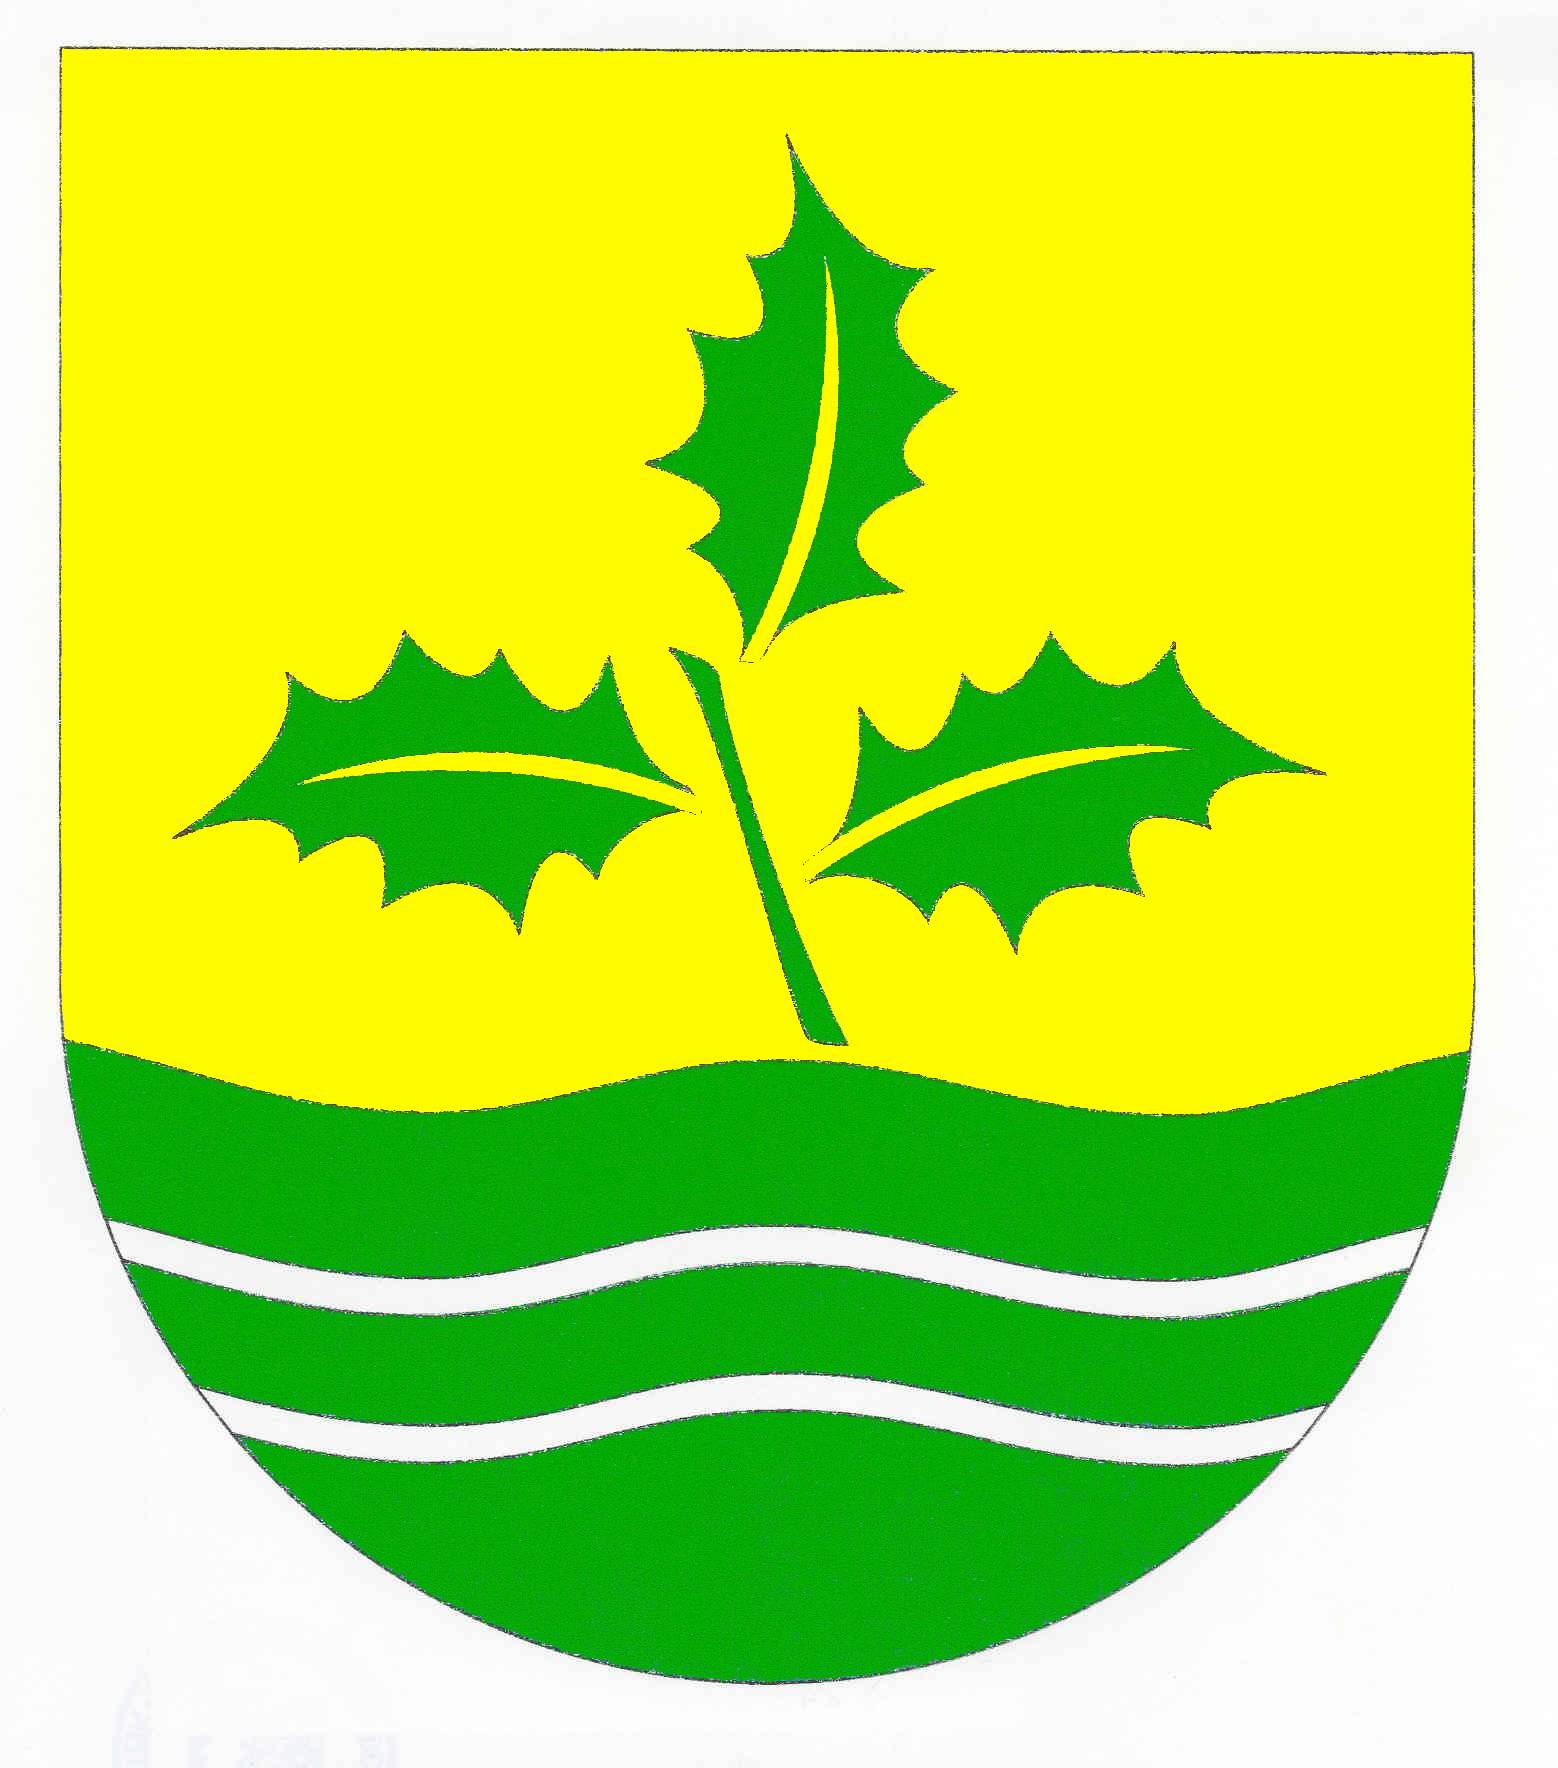 Wappen GemeindeKattendorf, Kreis Segeberg